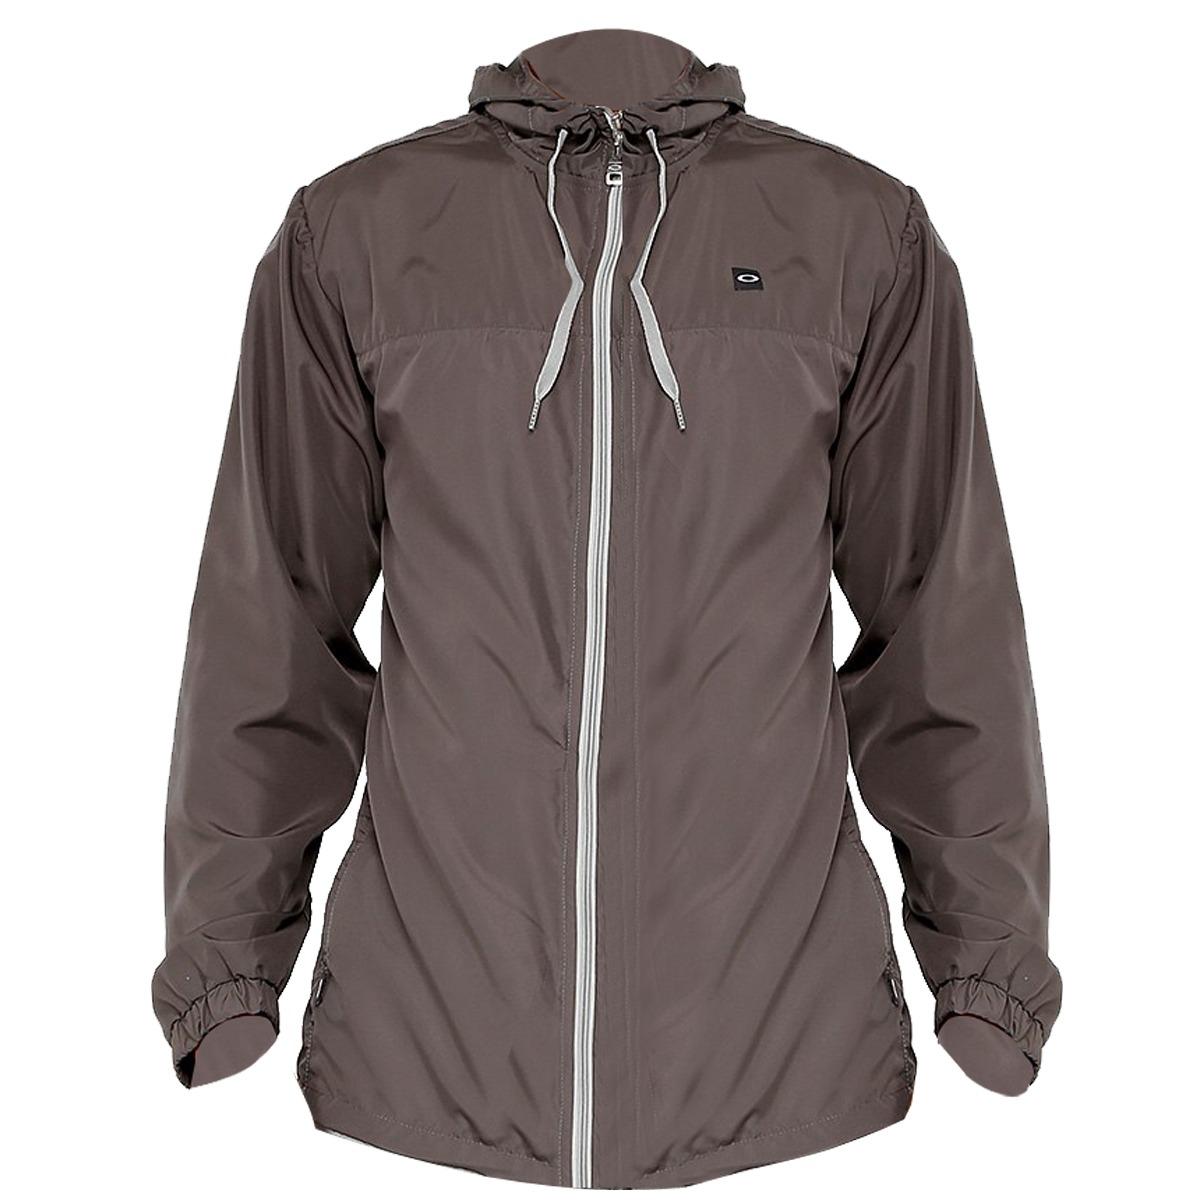 Jaqueta Oakley Windbreaker Patch Jacket Cinza - R  299,90 em Mercado ... 166be9c6cc